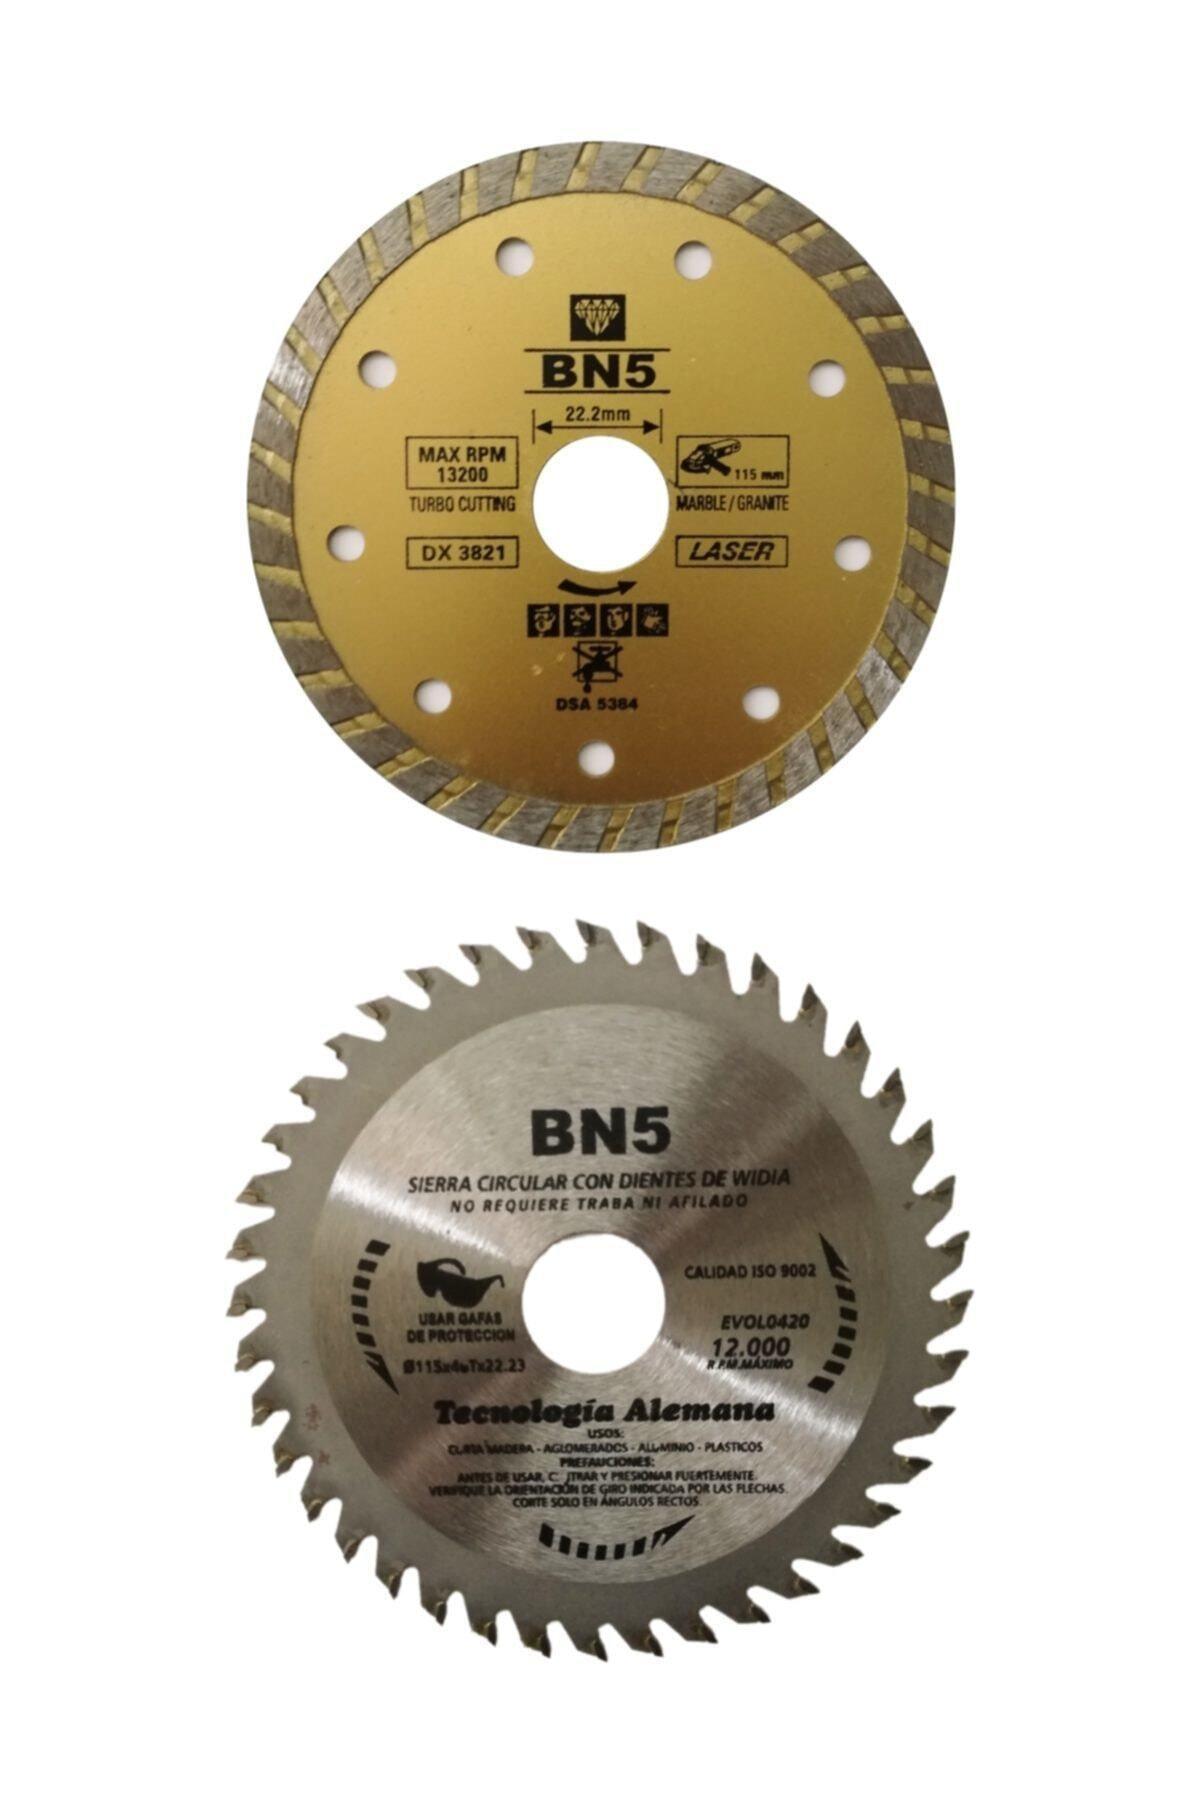 BN5 Ahşap Kesici Mermer Fayans Kesme 115 Mm Disk Seti Spiral Taşlama Kesici Diskleri 1